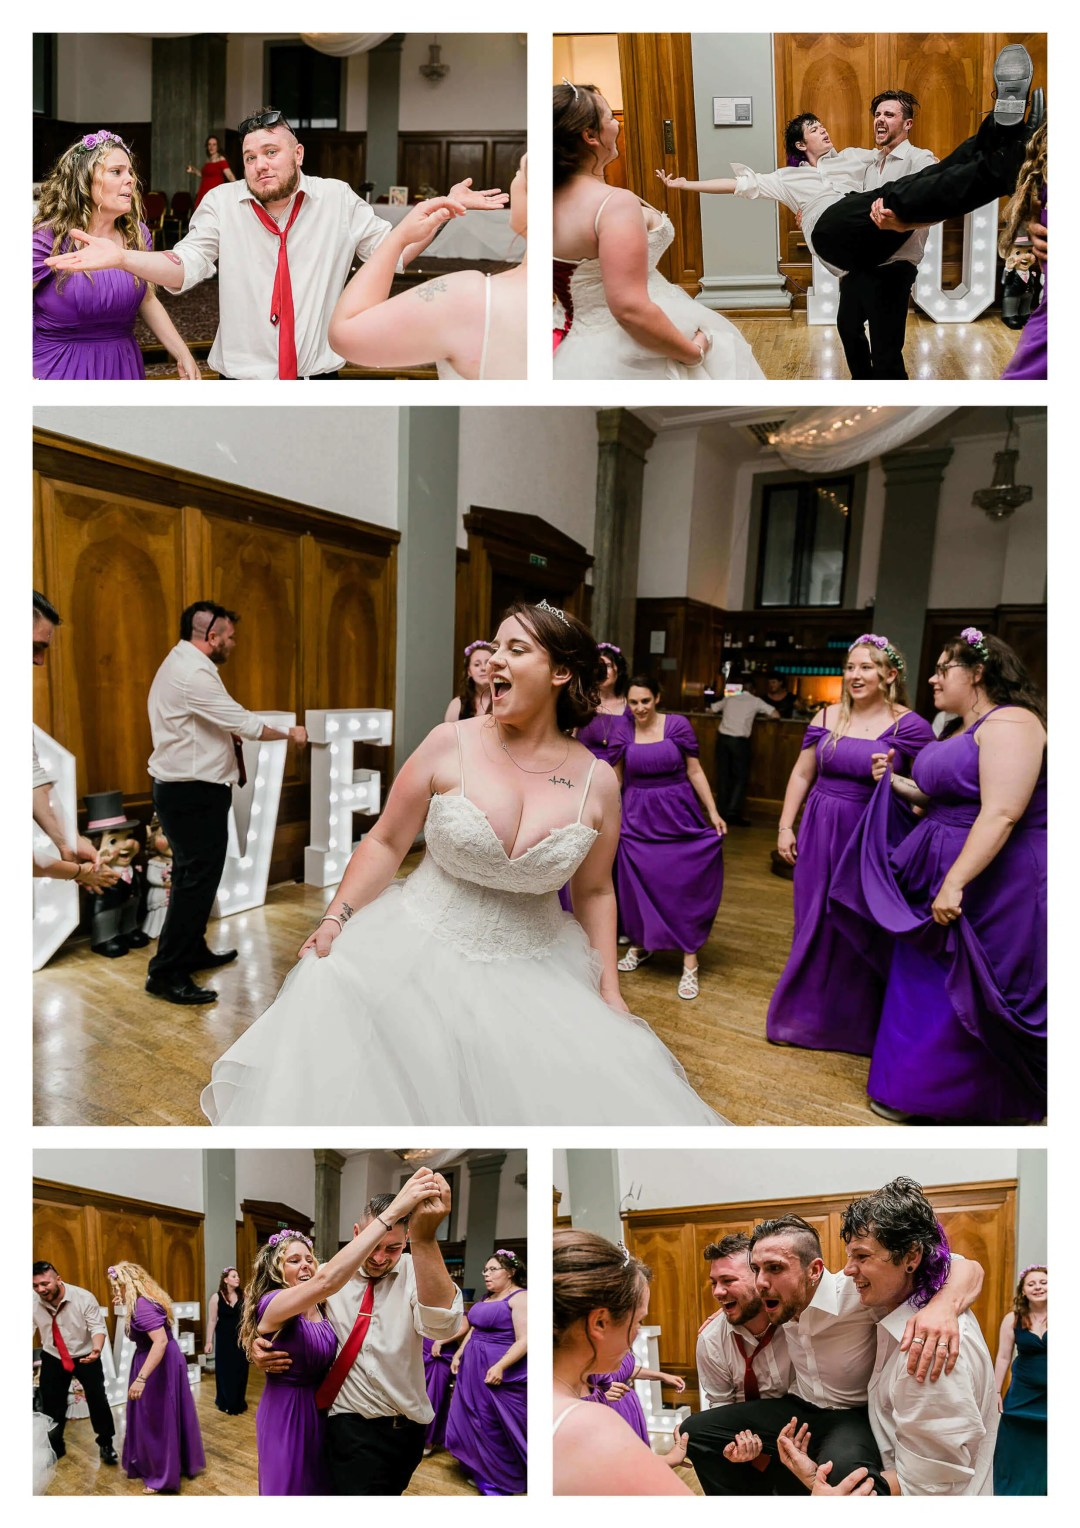 Pelham House wedding reception near Lewes Castle | Brighton Photographer